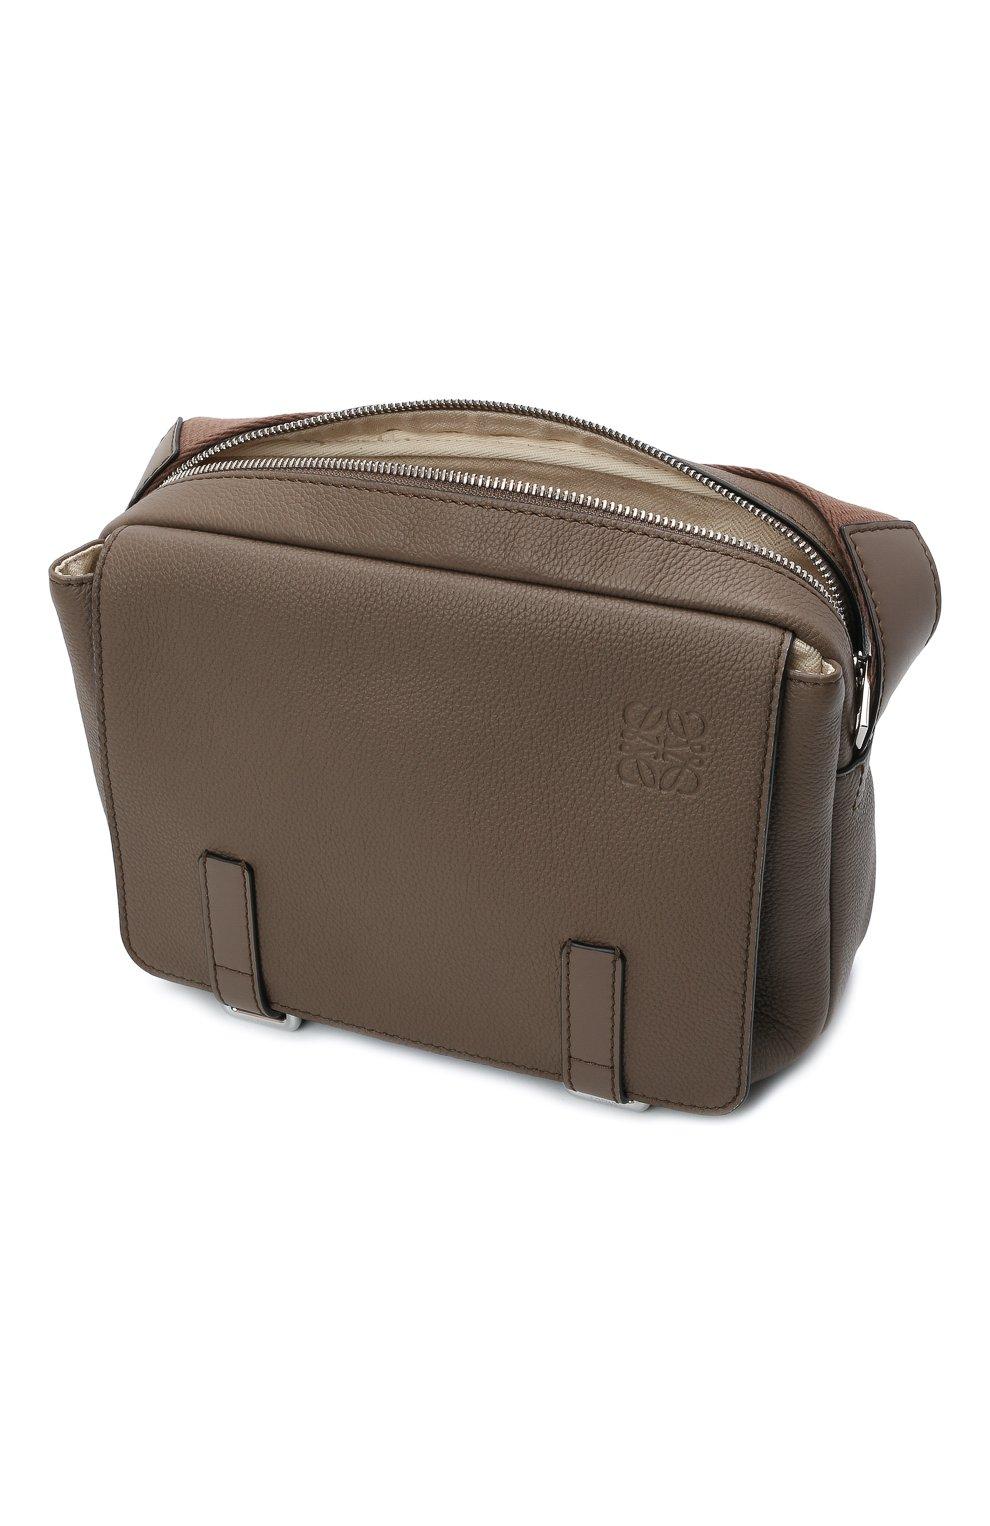 Мужская кожаная сумка xs military LOEWE светло-коричневого цвета, арт. 317.12AA72   Фото 4